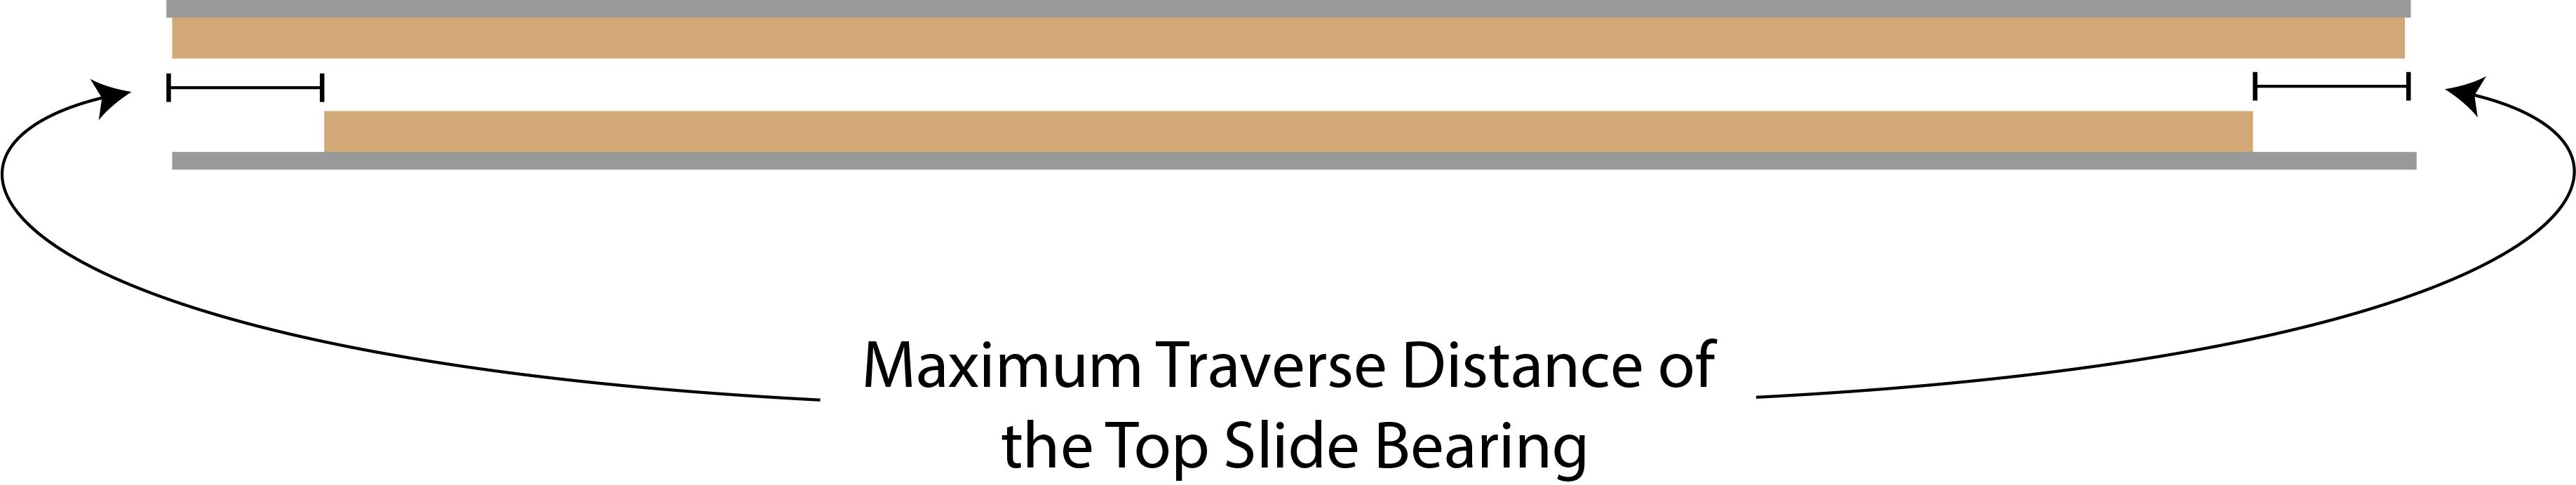 traverse_distance